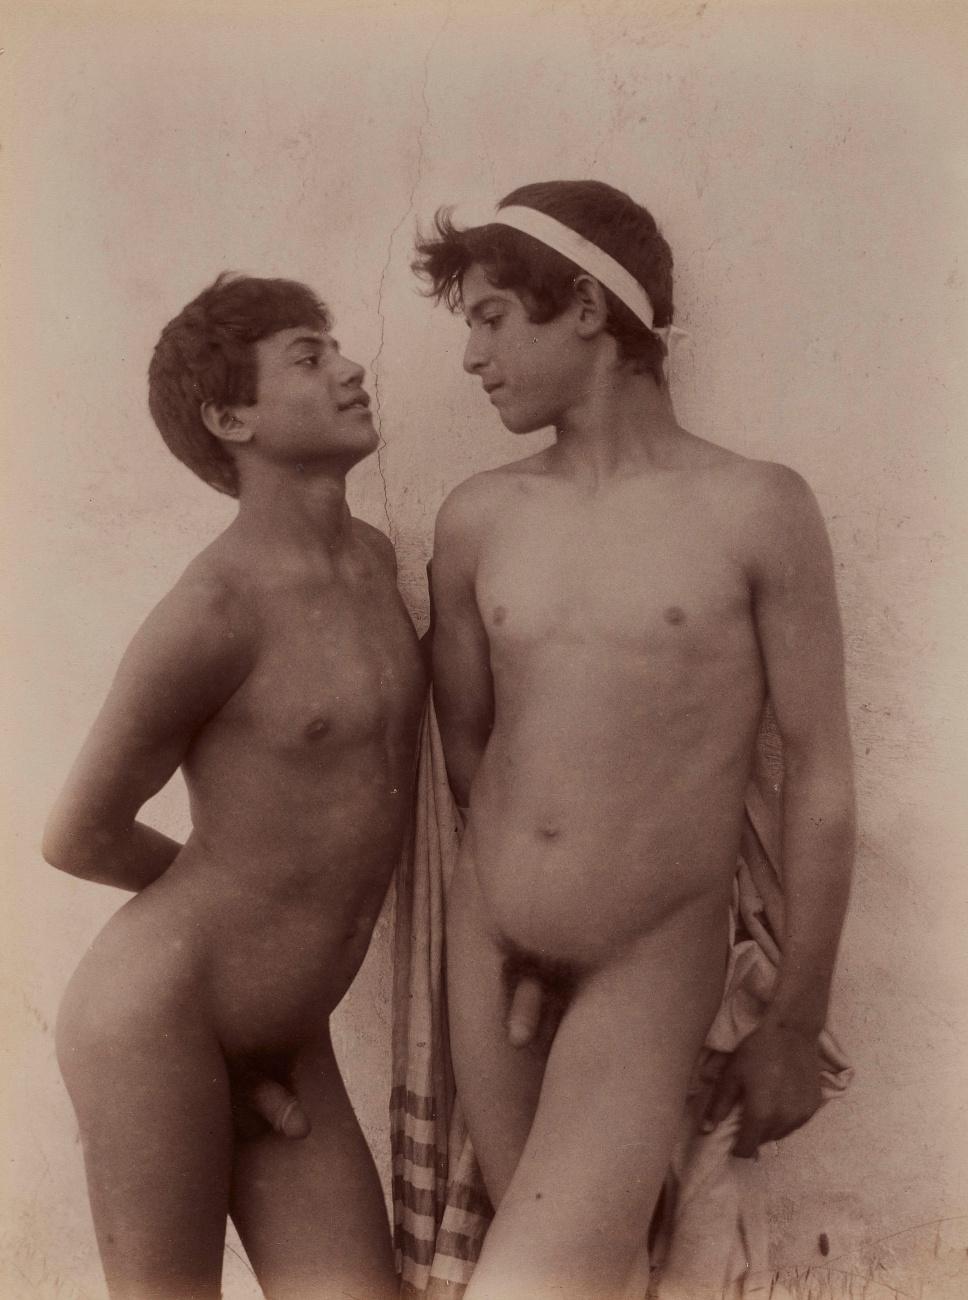 Nudes of boys cute